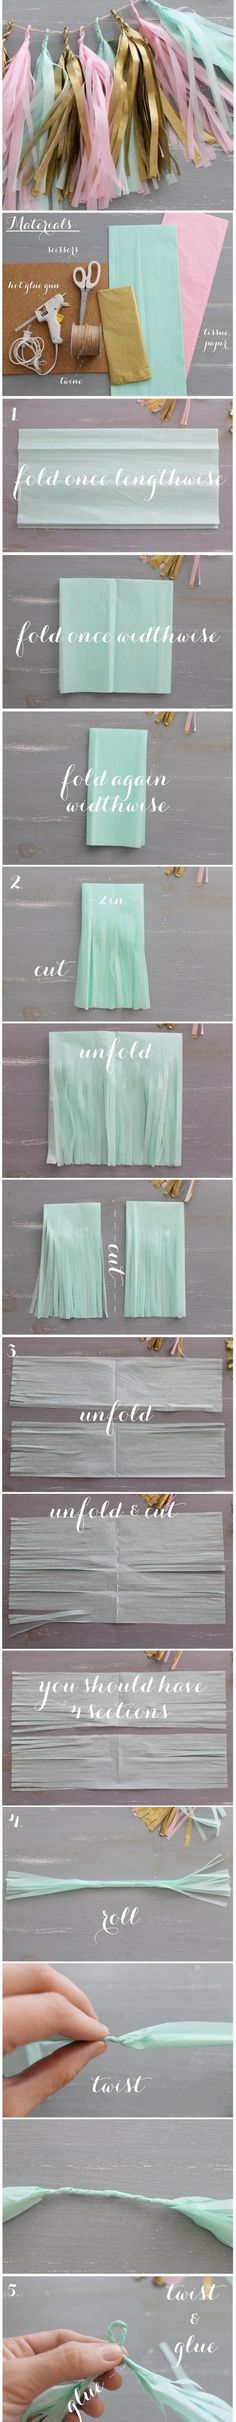 Sociedad https://noahxnw.tumblr.com/post/160711730786/floral-wedding-arches-decorating-ideas